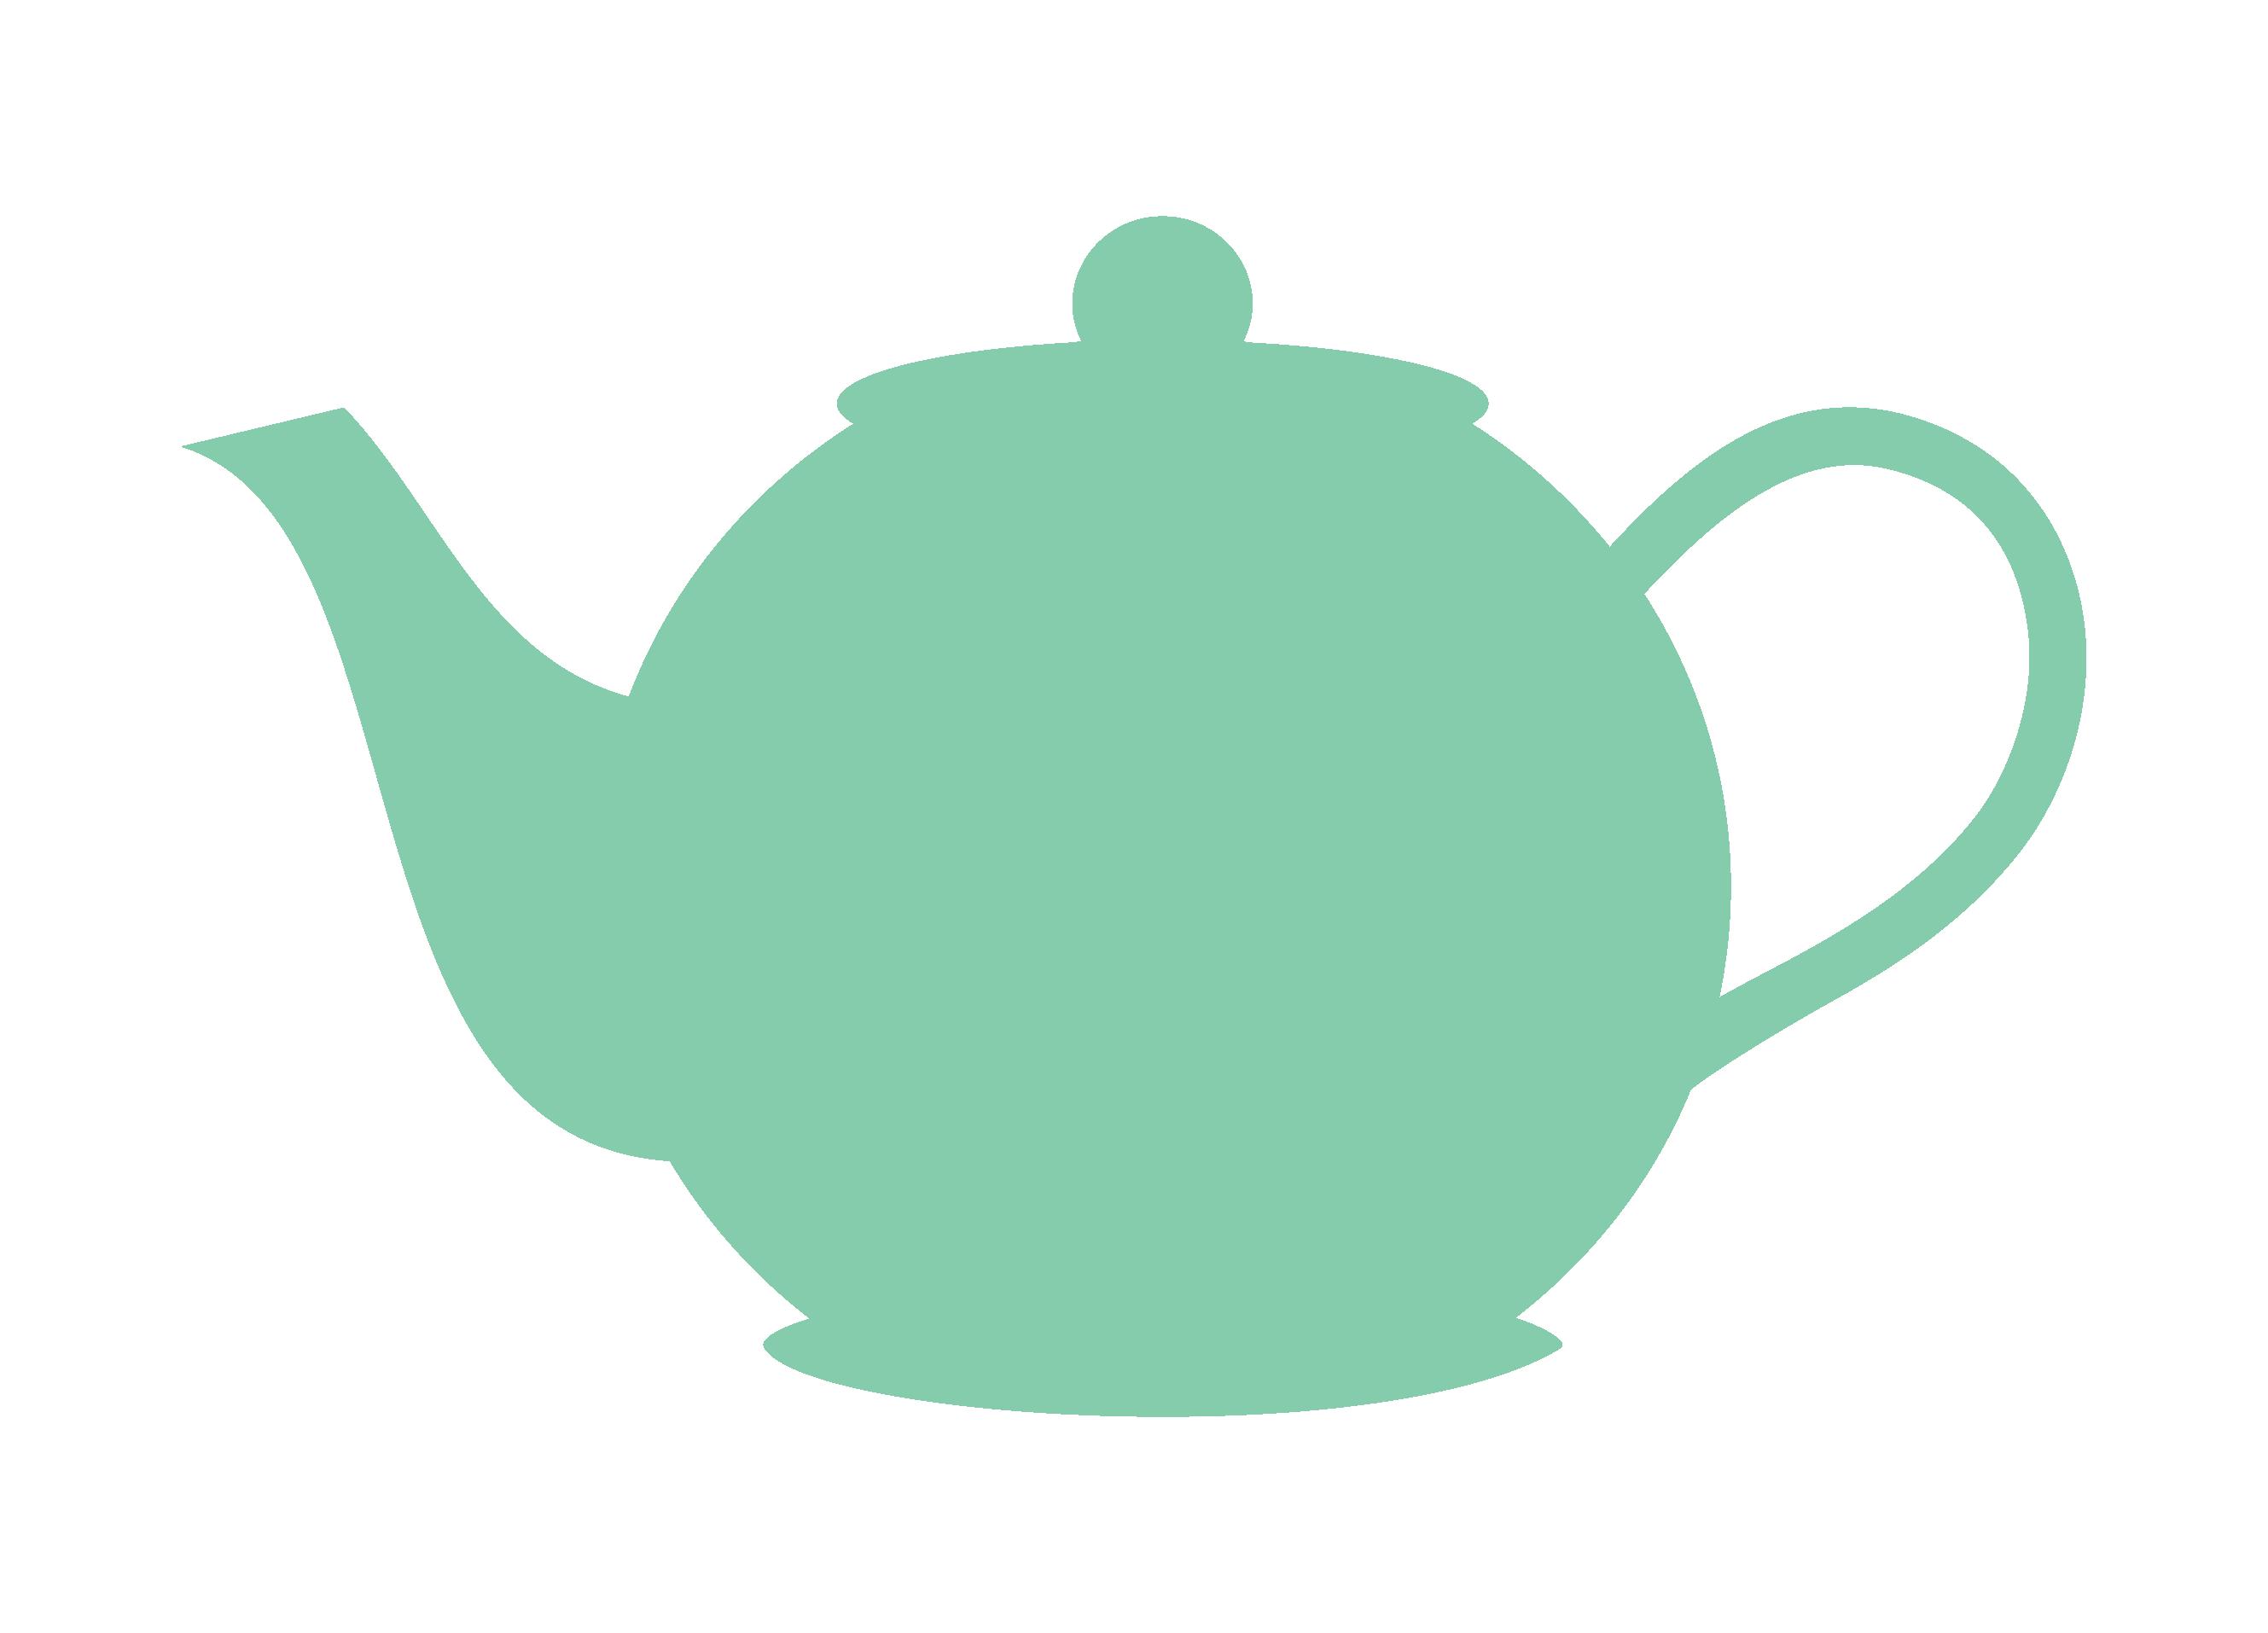 2658x1914 Tea Pot Teapot Clipart Cc Kitchen Utensils Clip Art Teapot.png